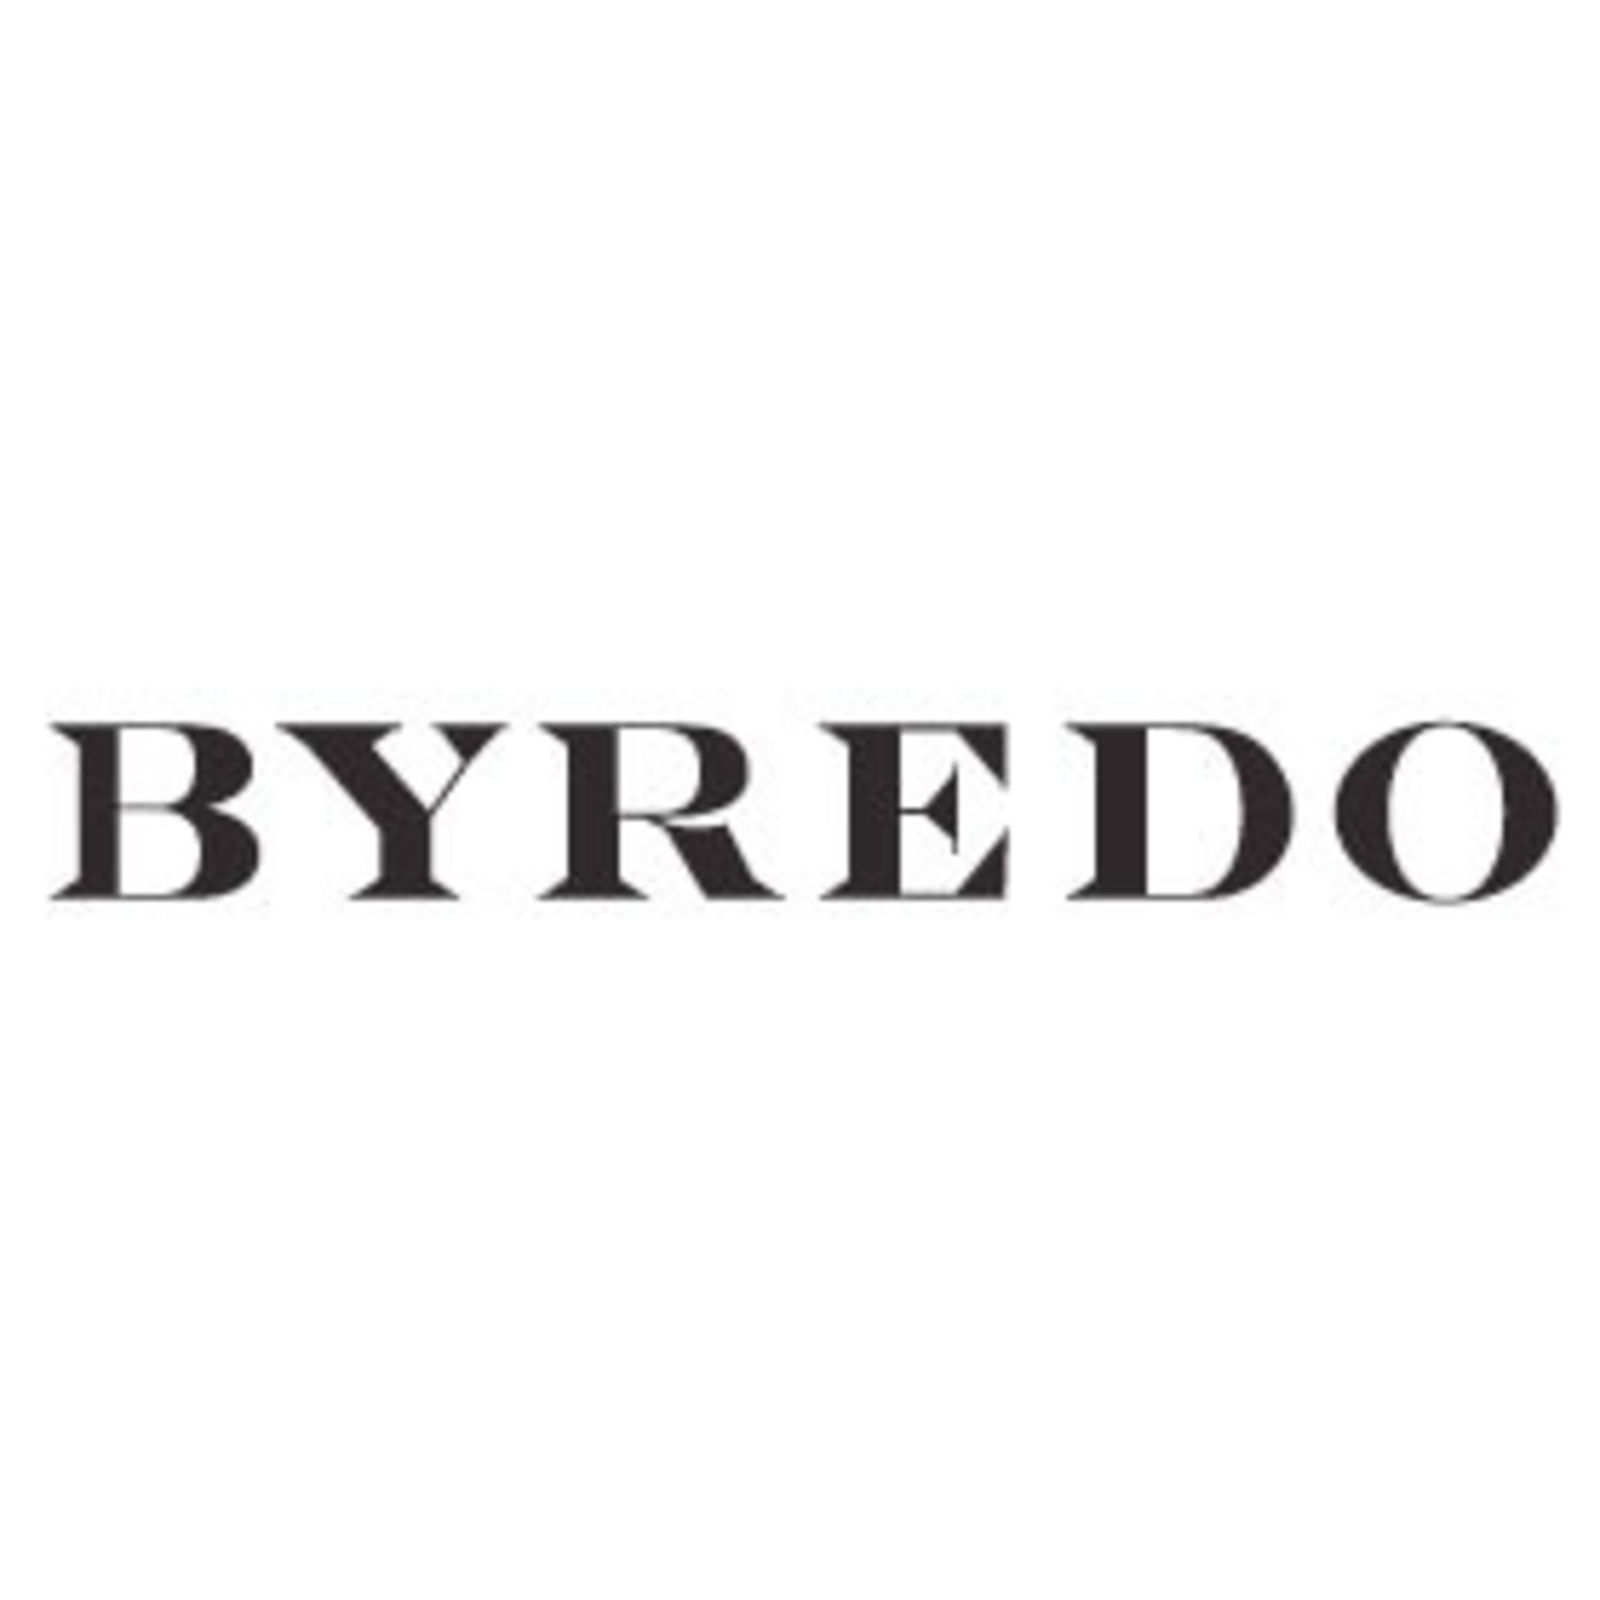 BYREDO (Image 1)